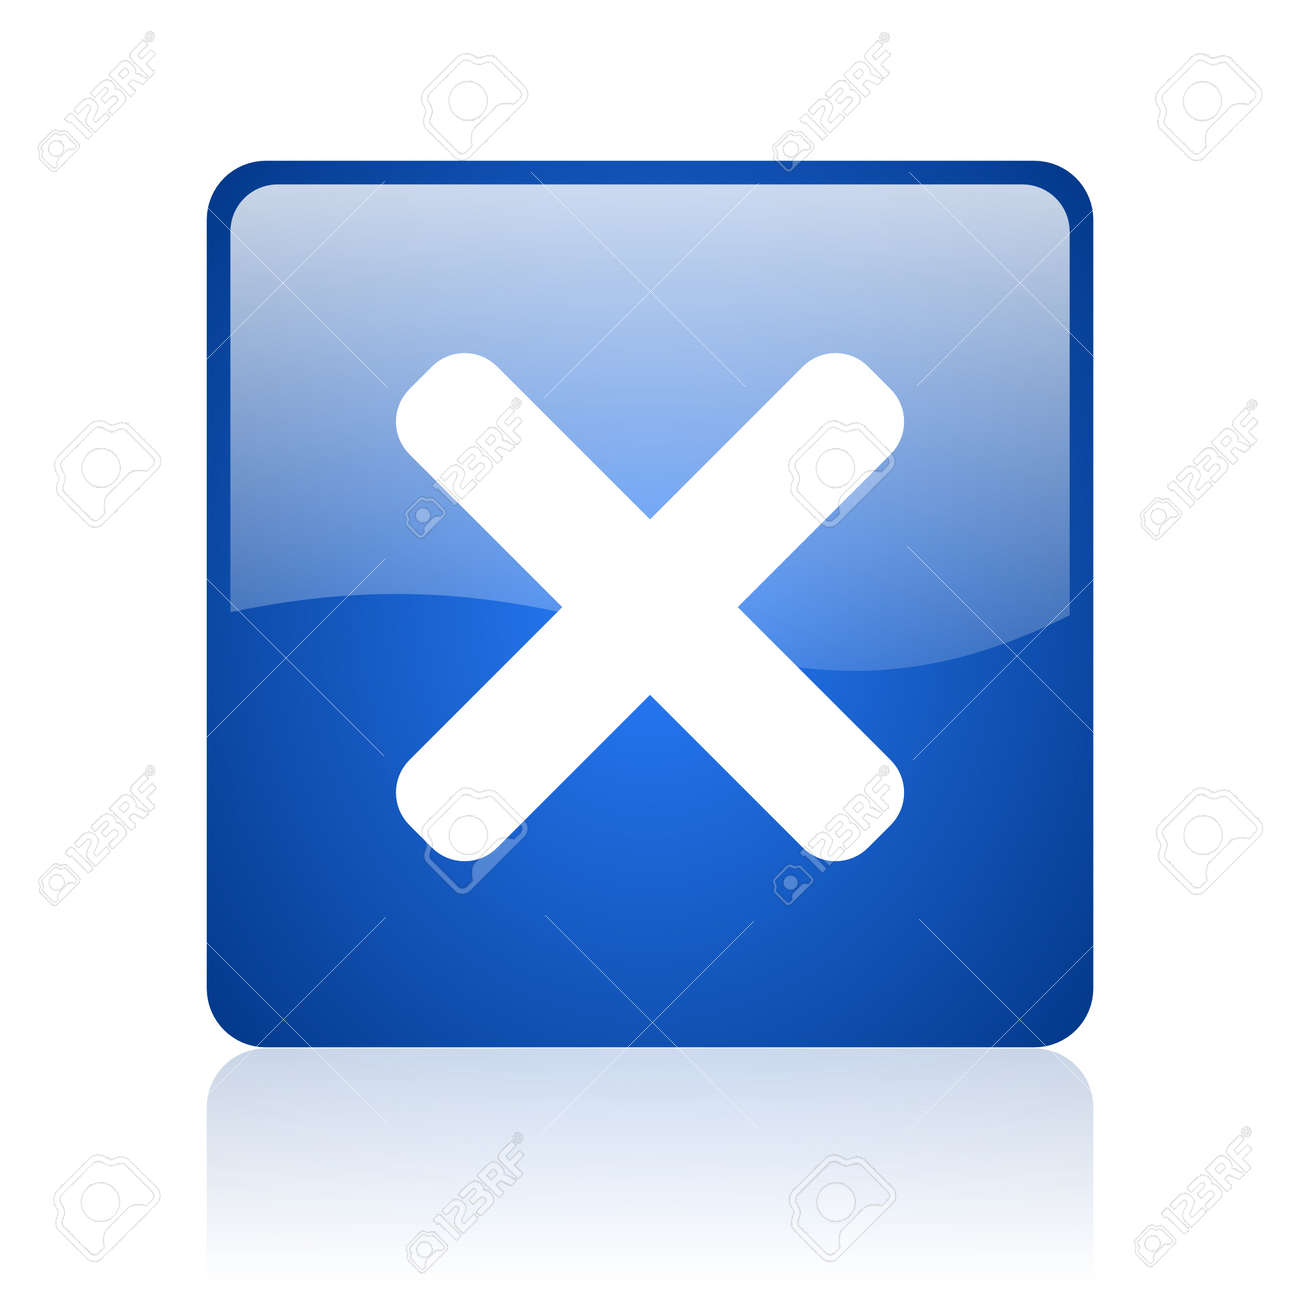 cancel blue square glossy web icon on white background Stock Photo - 18037086